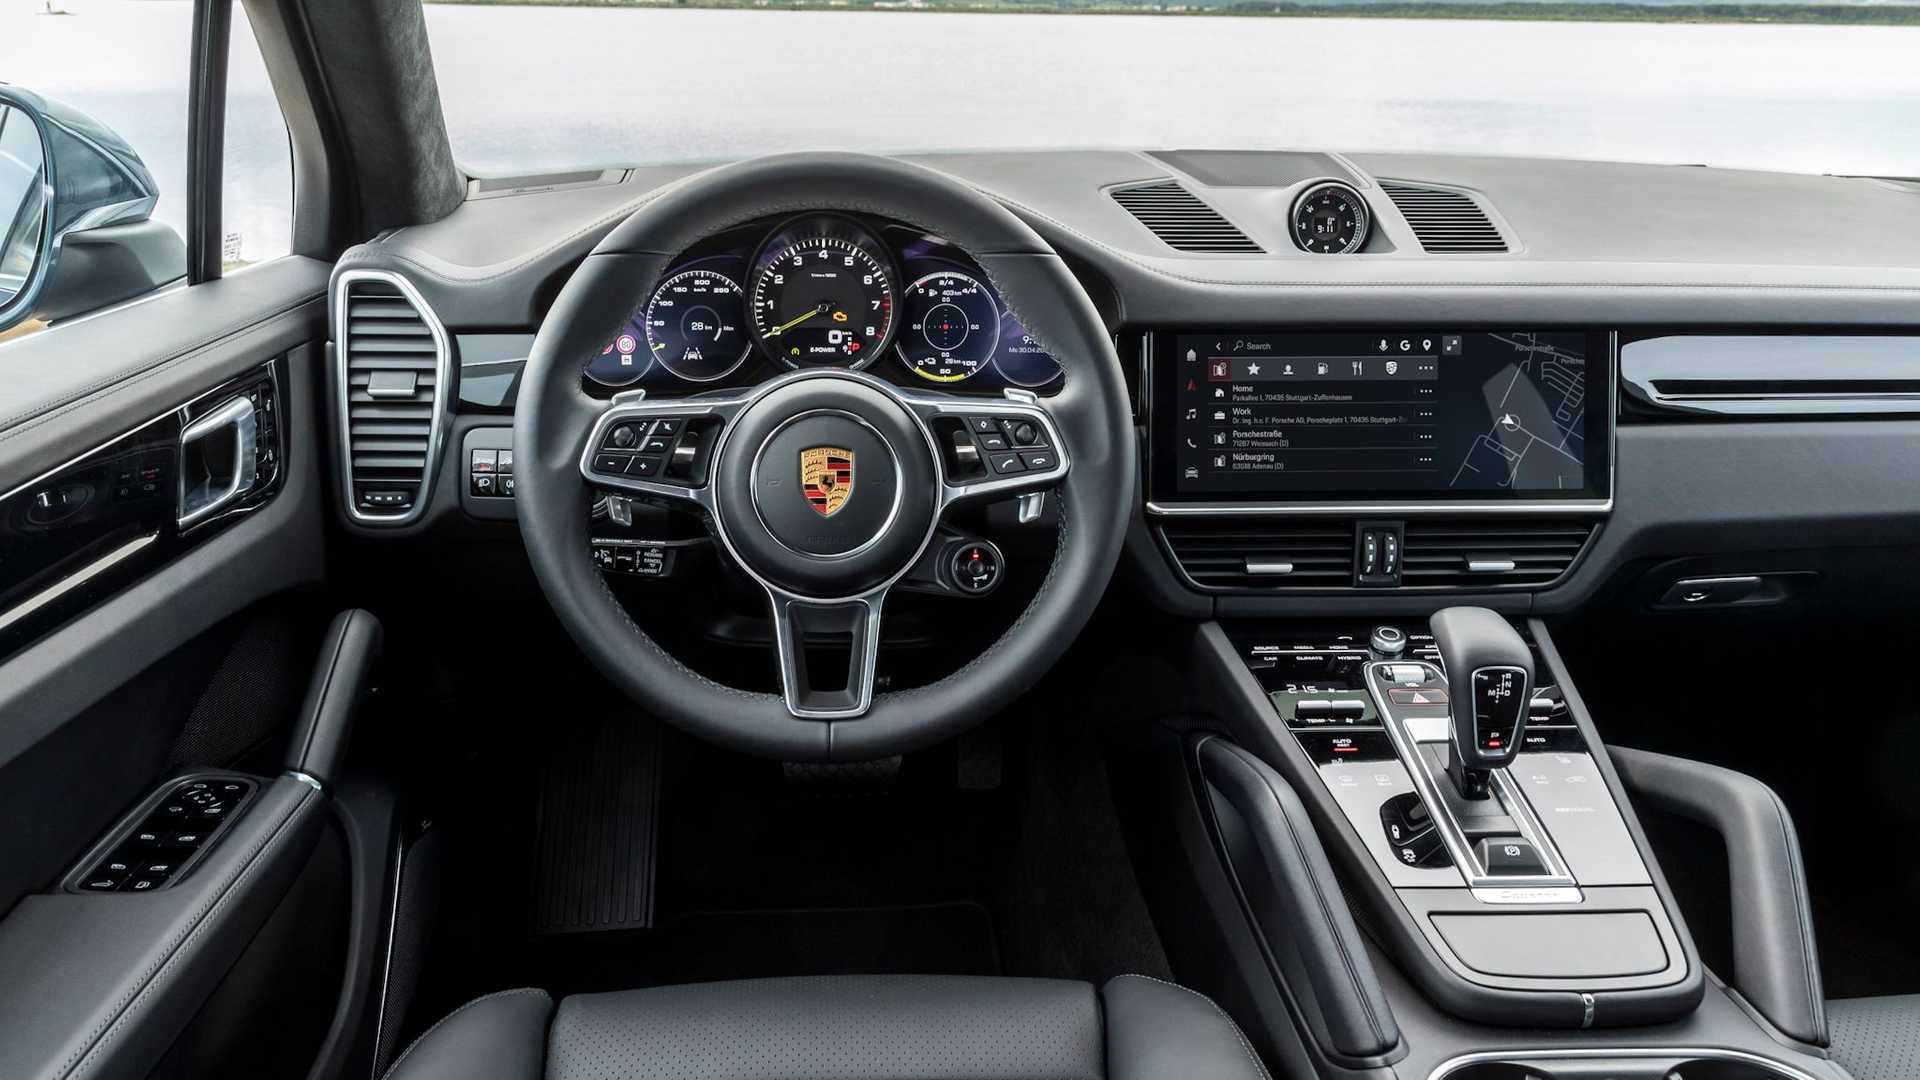 Porsche-Communication-Management-6-3